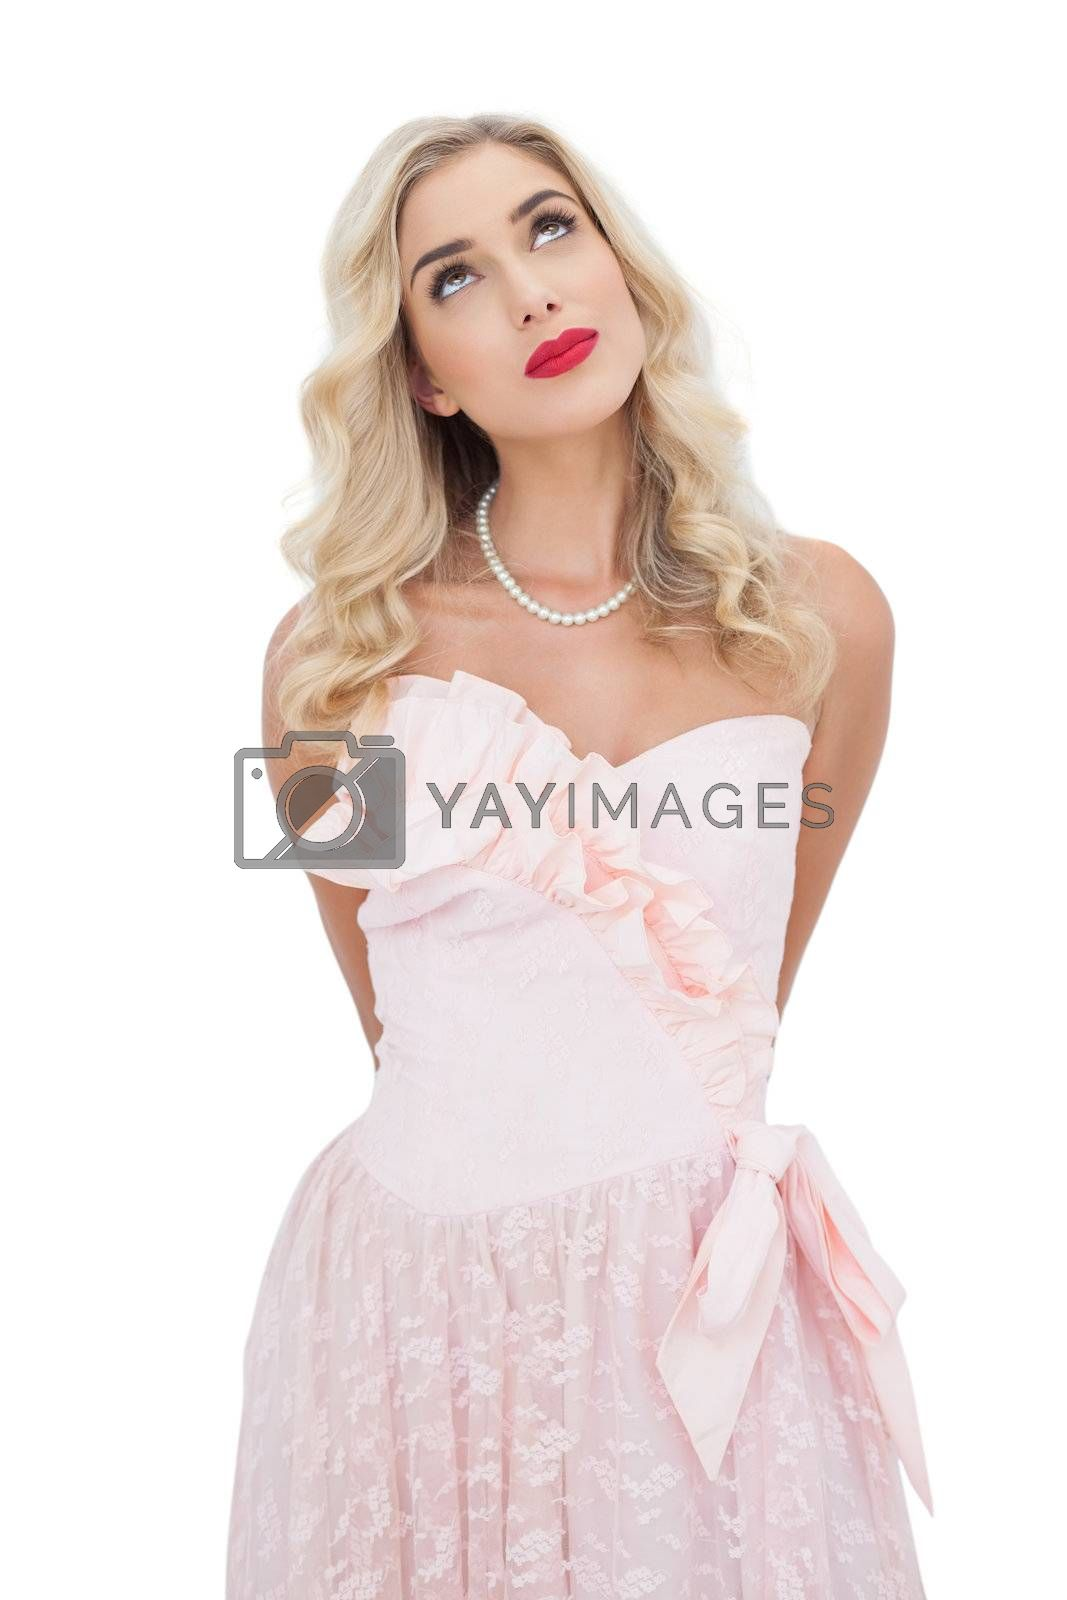 Thinking blonde model in pink dress posing looking away by Wavebreakmedia